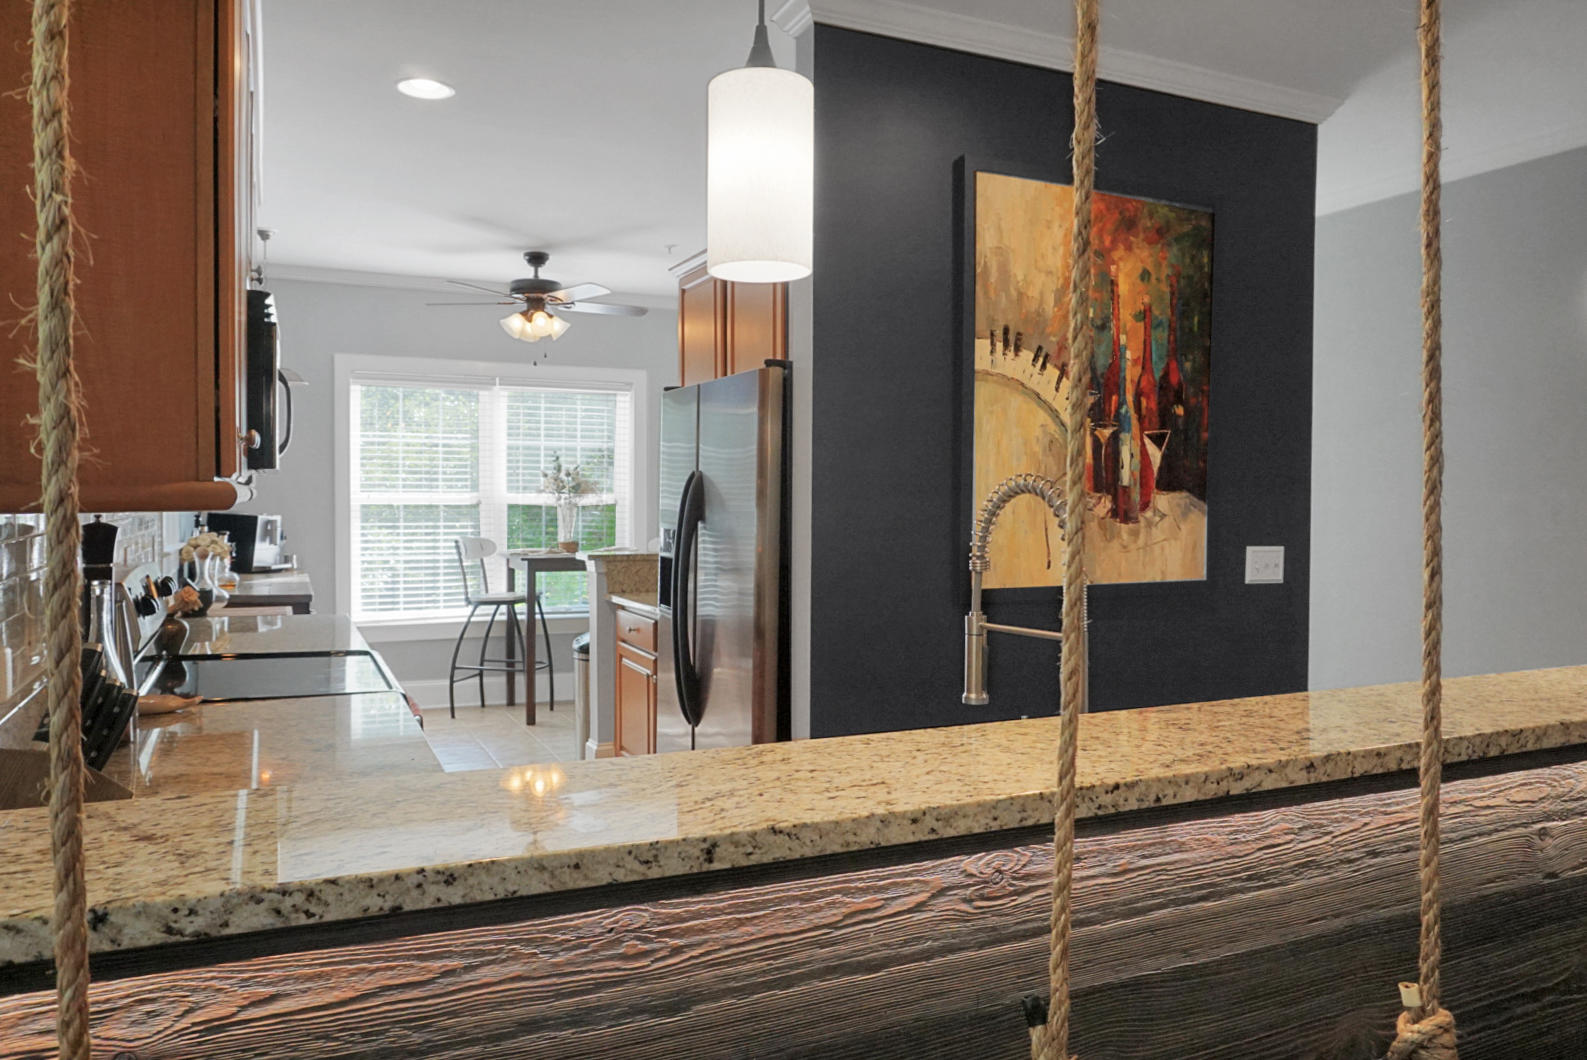 Etiwan Pointe Homes For Sale - 269 Etiwan Pointe, Mount Pleasant, SC - 37